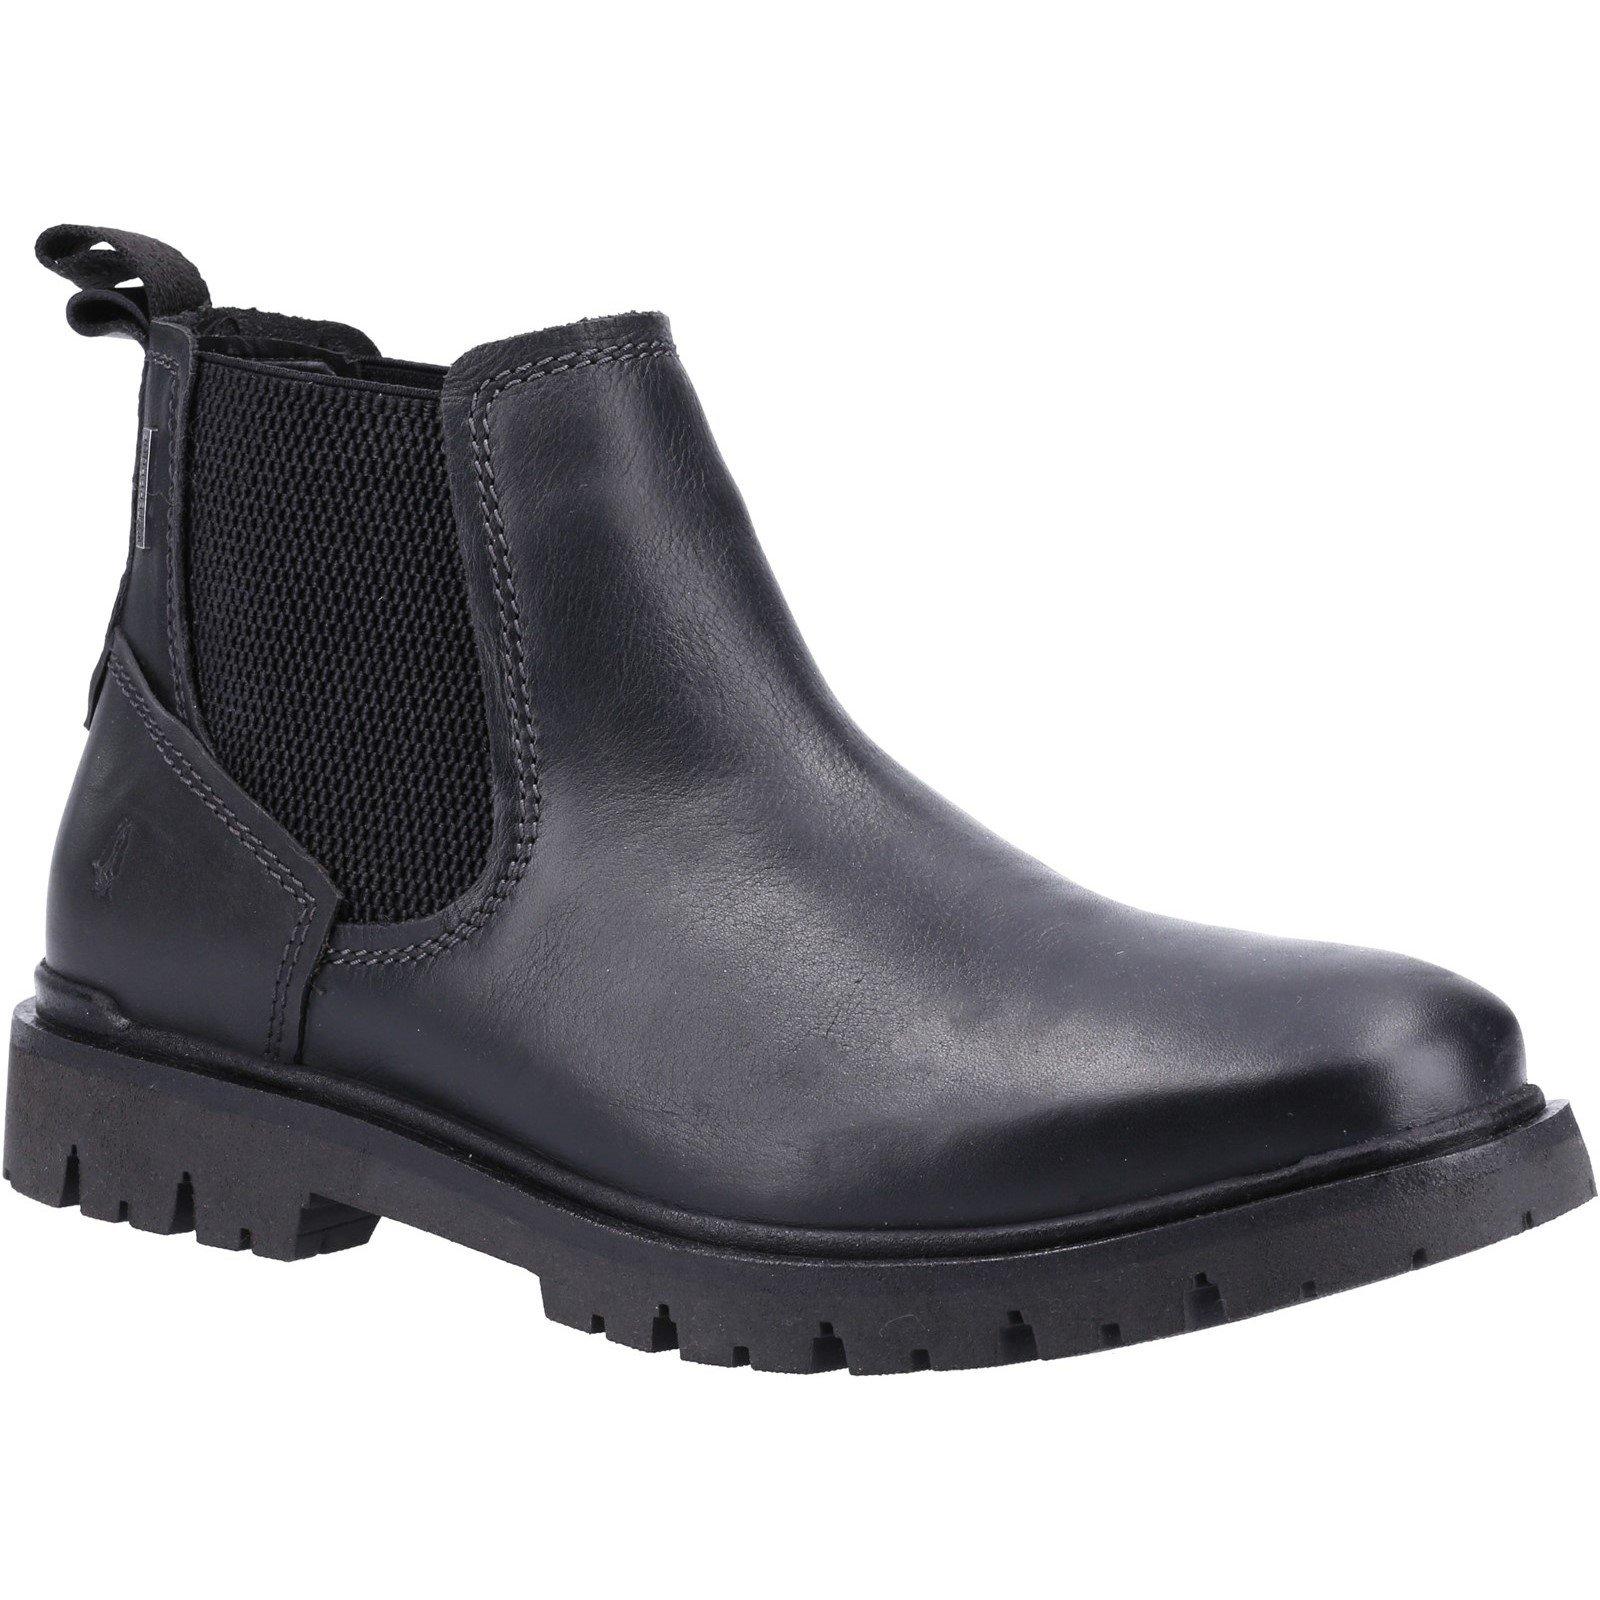 Hush Puppies Men's Paxton Chelsea Boot Various Colours 32882 - Black 11